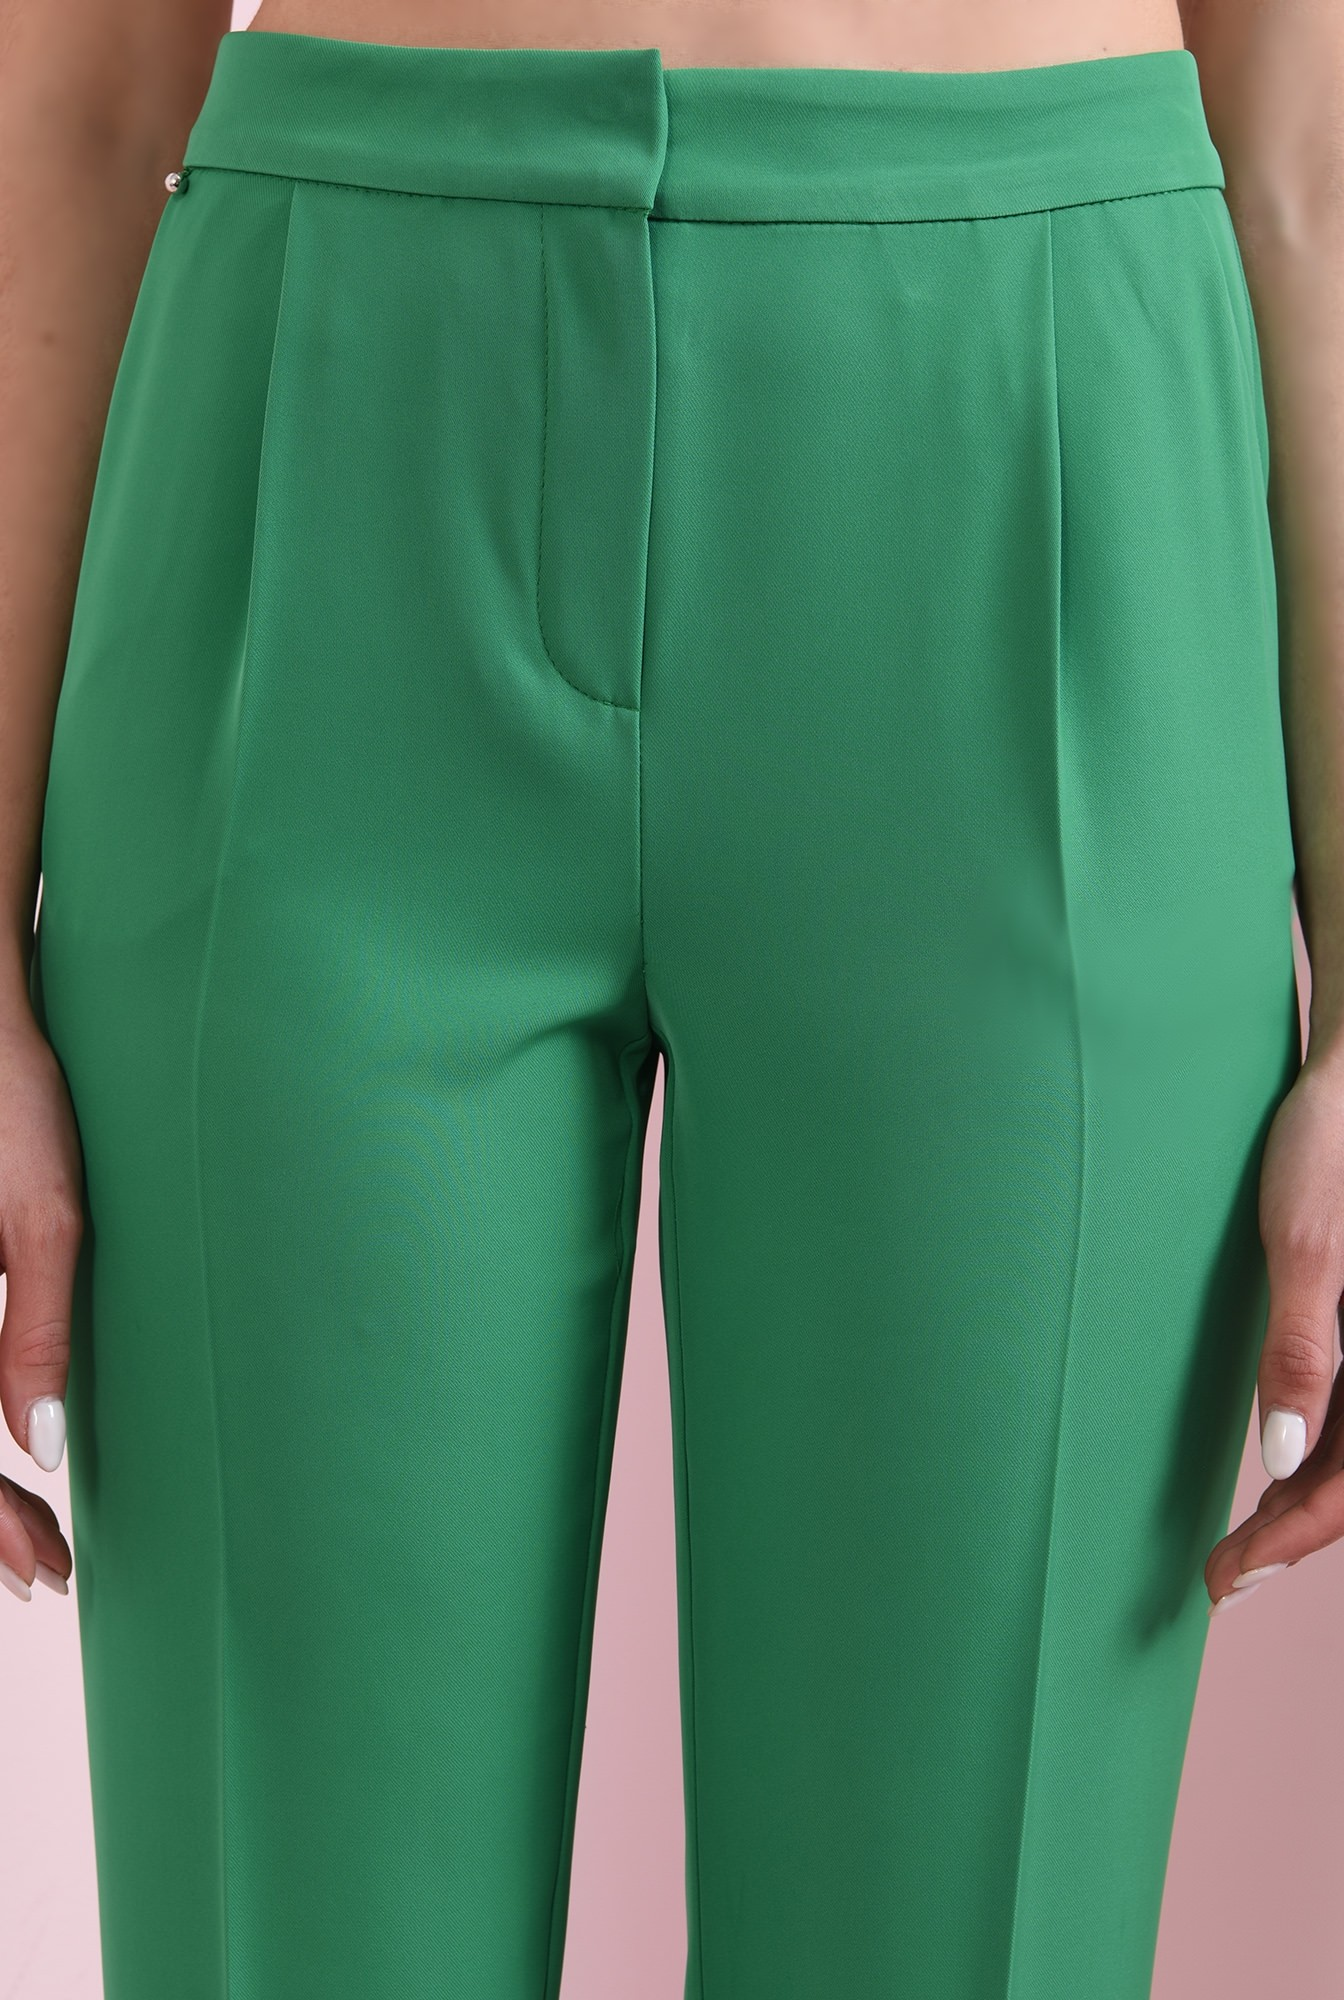 3 - pantaloni cu talie medie, cu buzunare